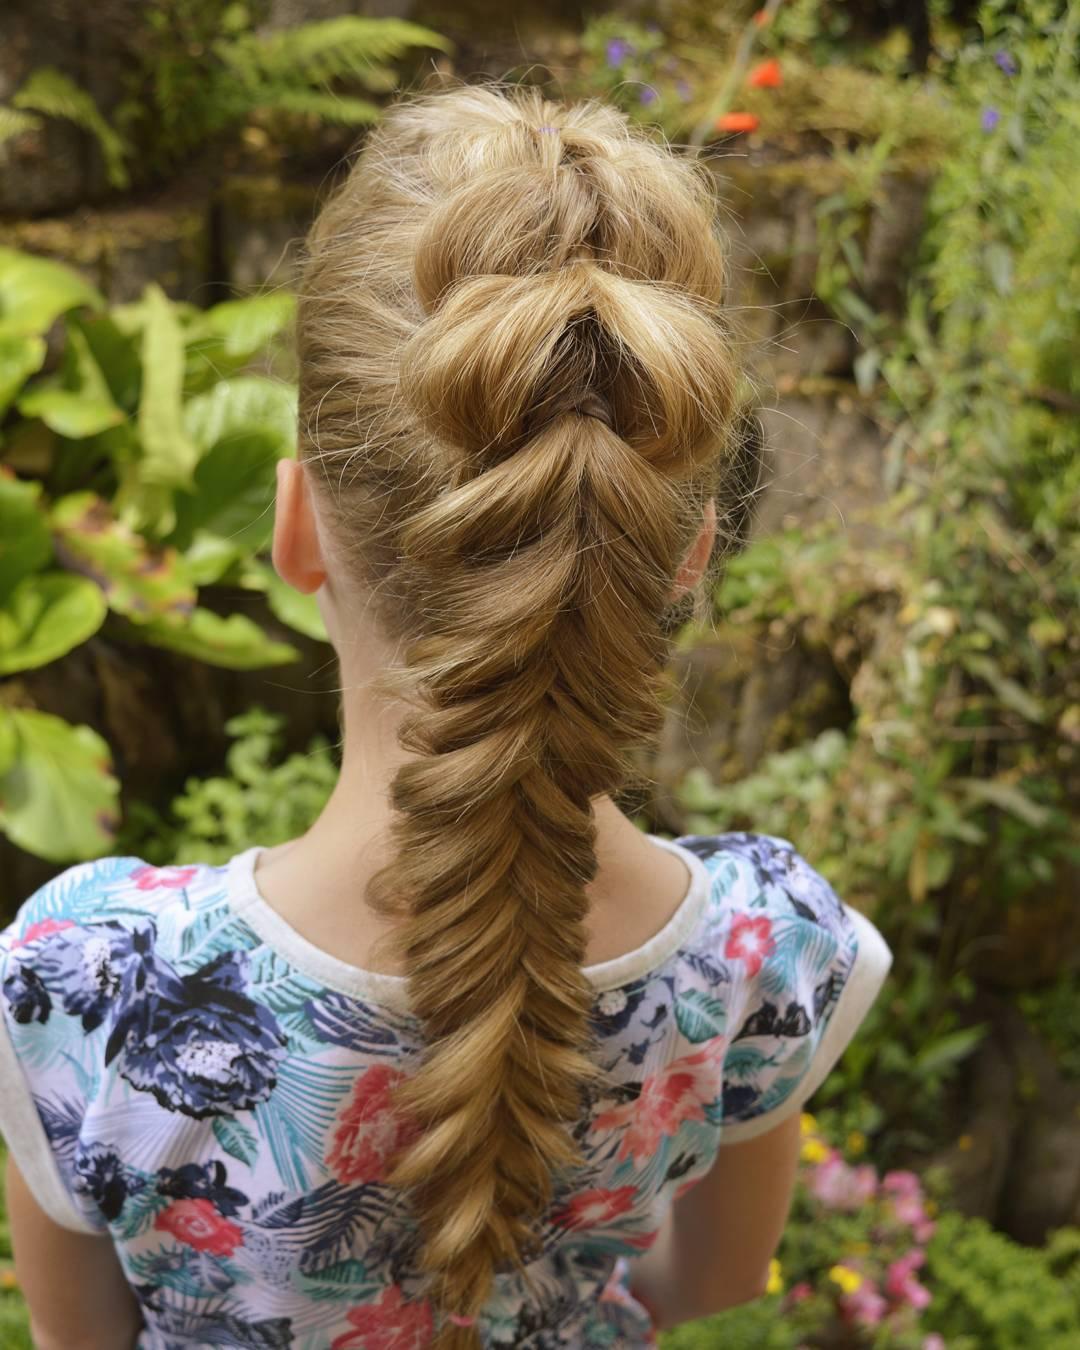 100 Cute Hairstyles + Haircuts For Long Hair (2020 Styles)